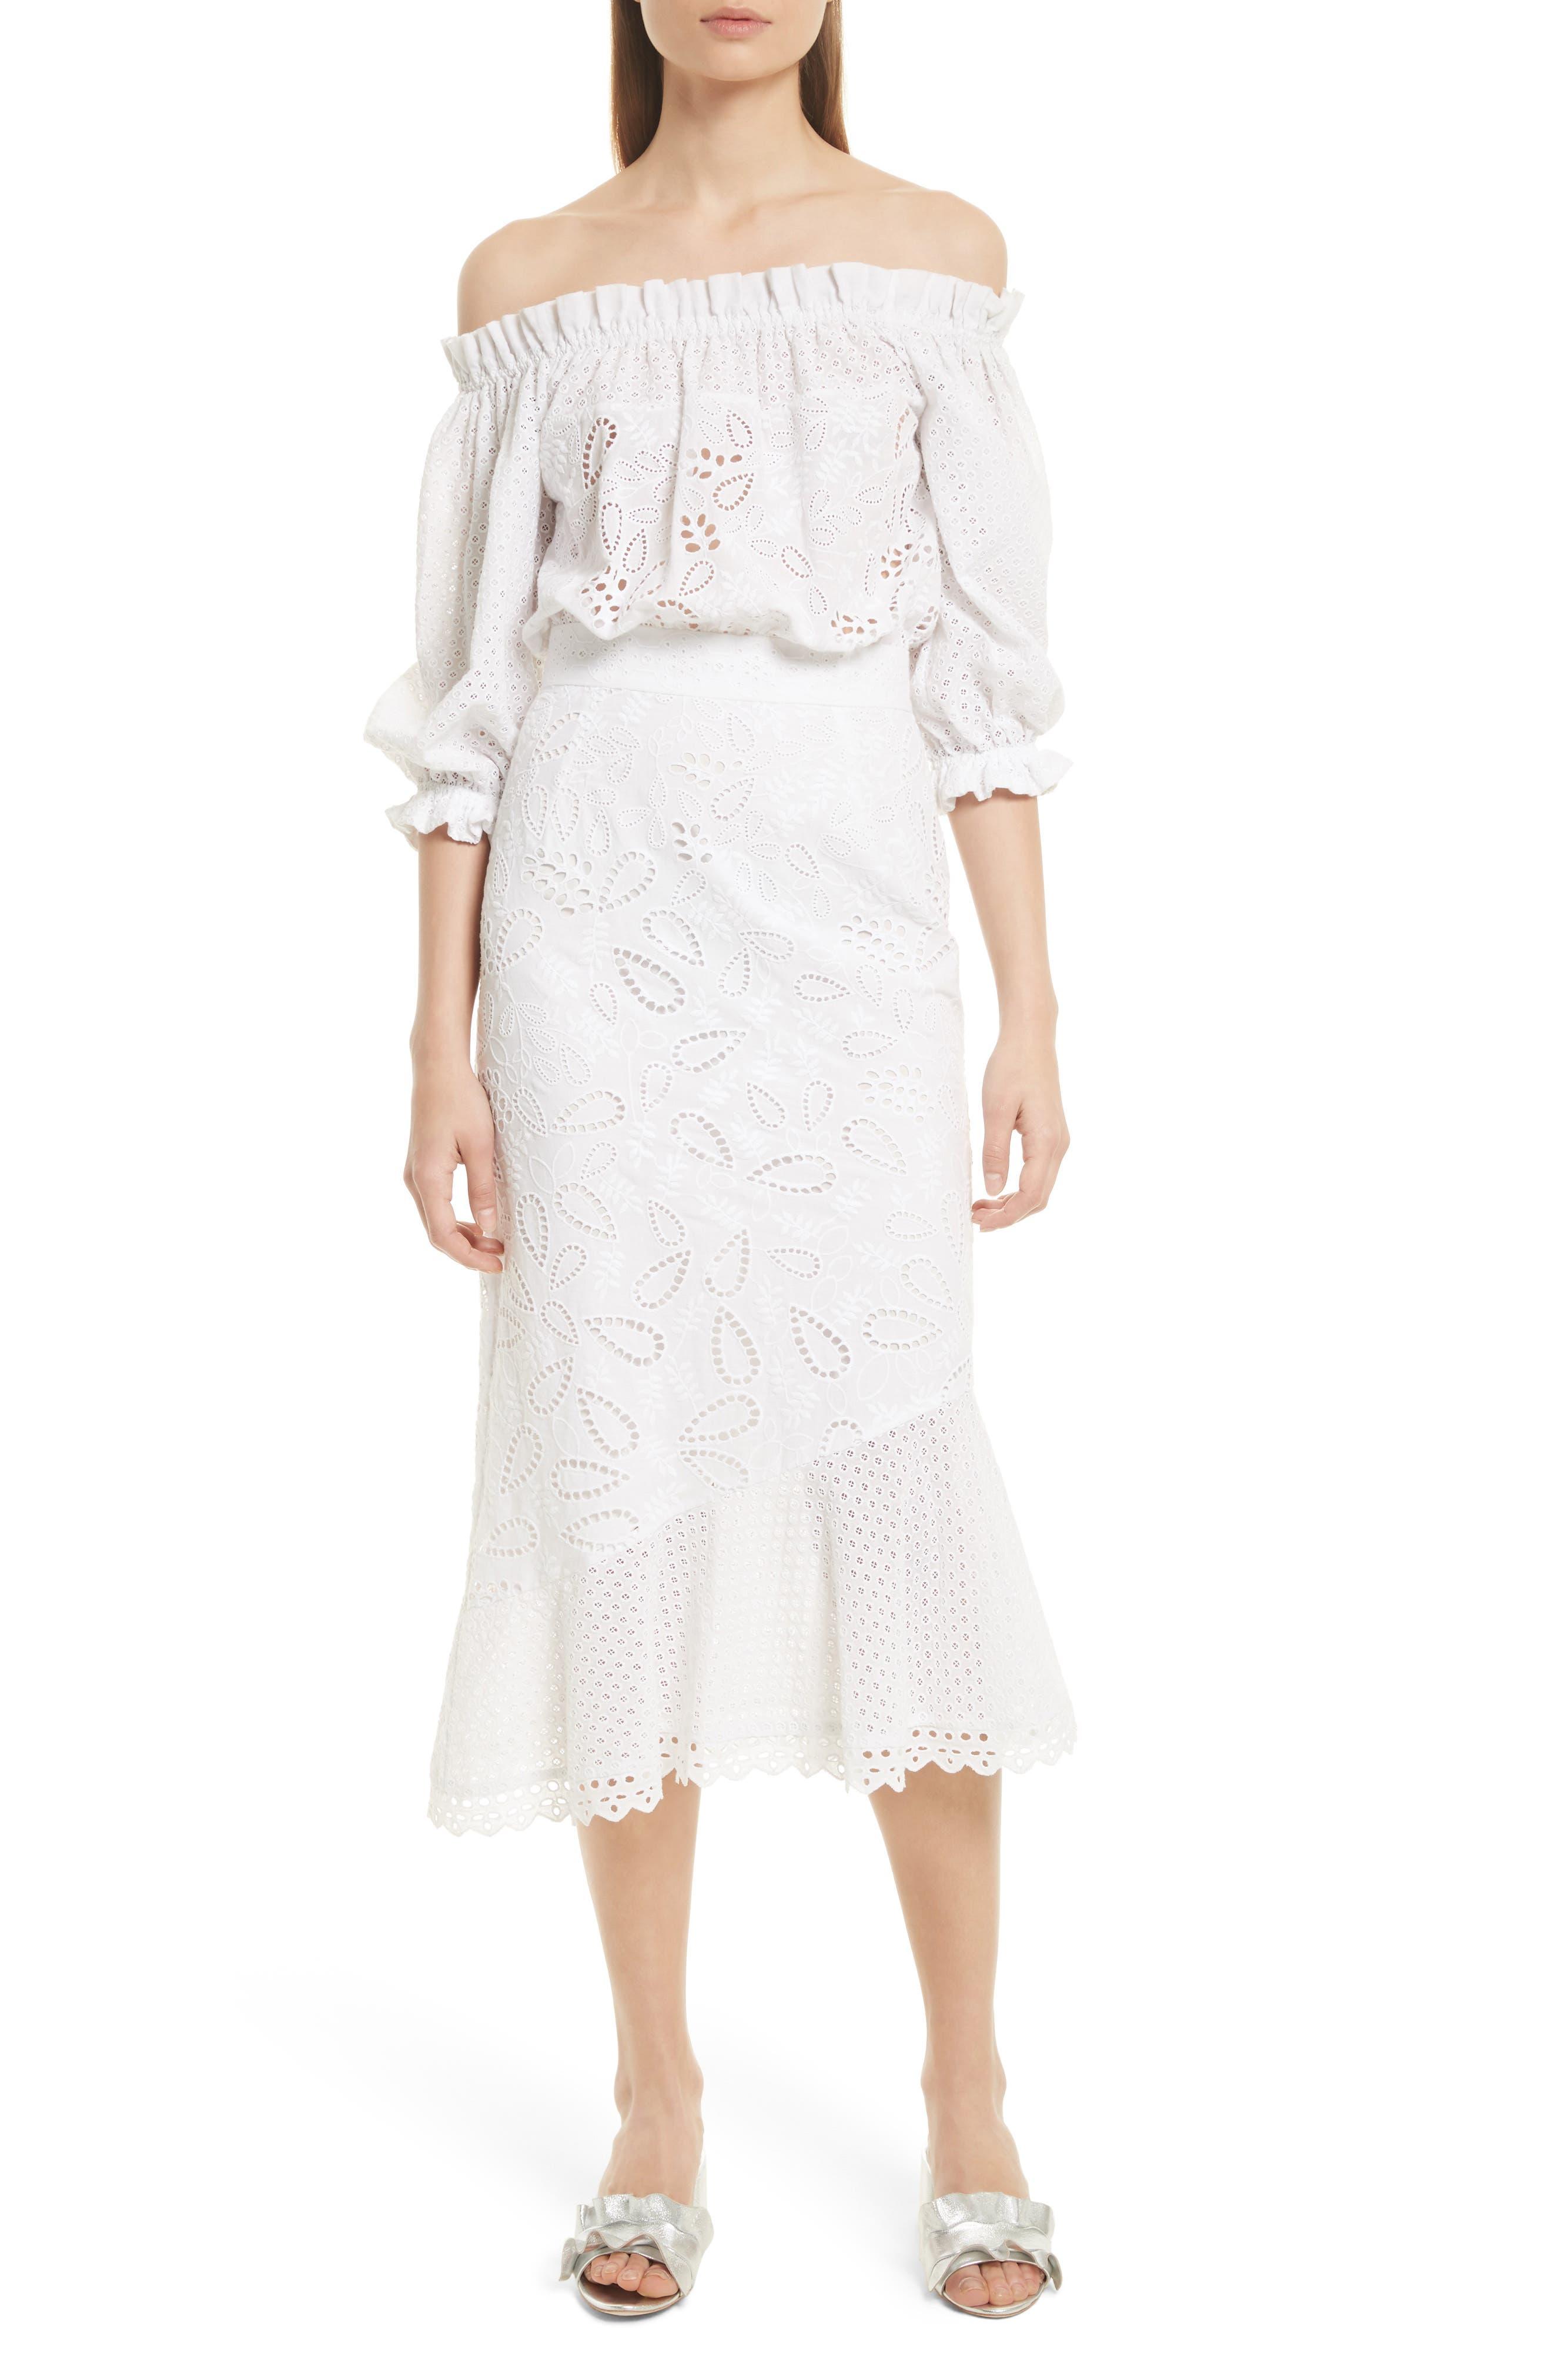 Grace Cotton Off the Shoulder Dress,                             Main thumbnail 1, color,                             White/ French Lace